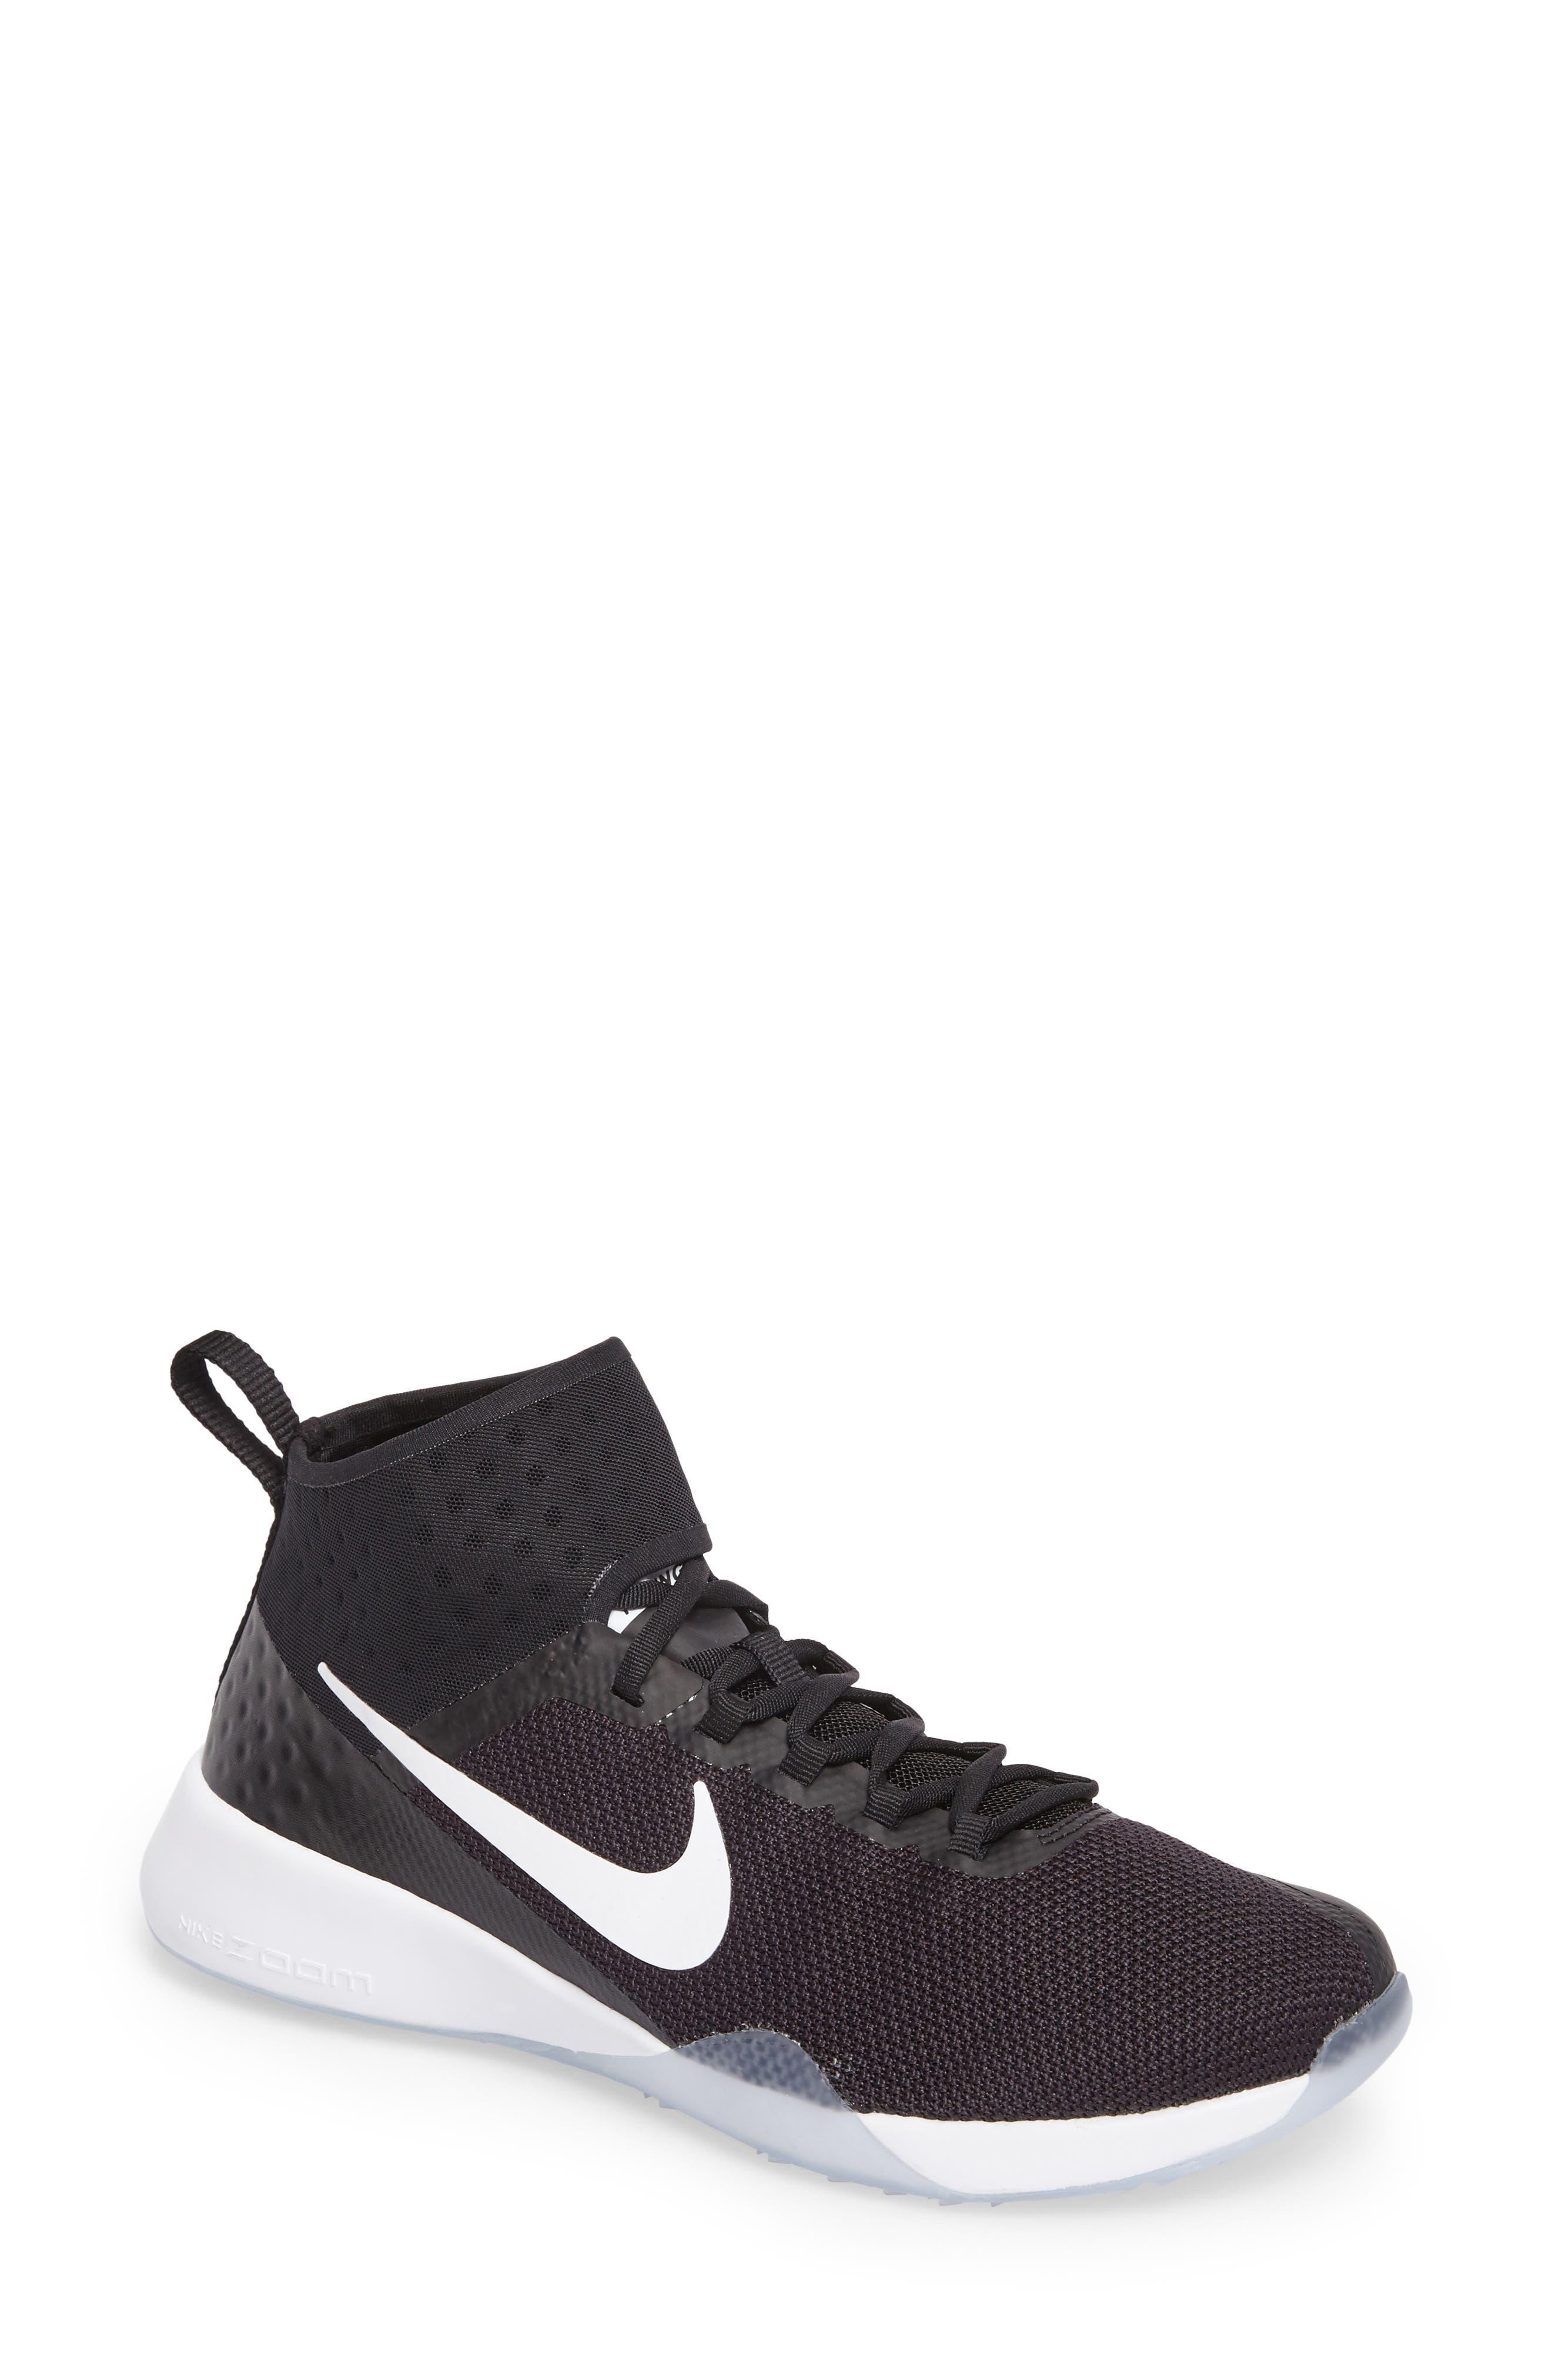 NikeLab Air Zoom Strong 2 Training Shoe,                             Main thumbnail 1, color,                             Black/ White